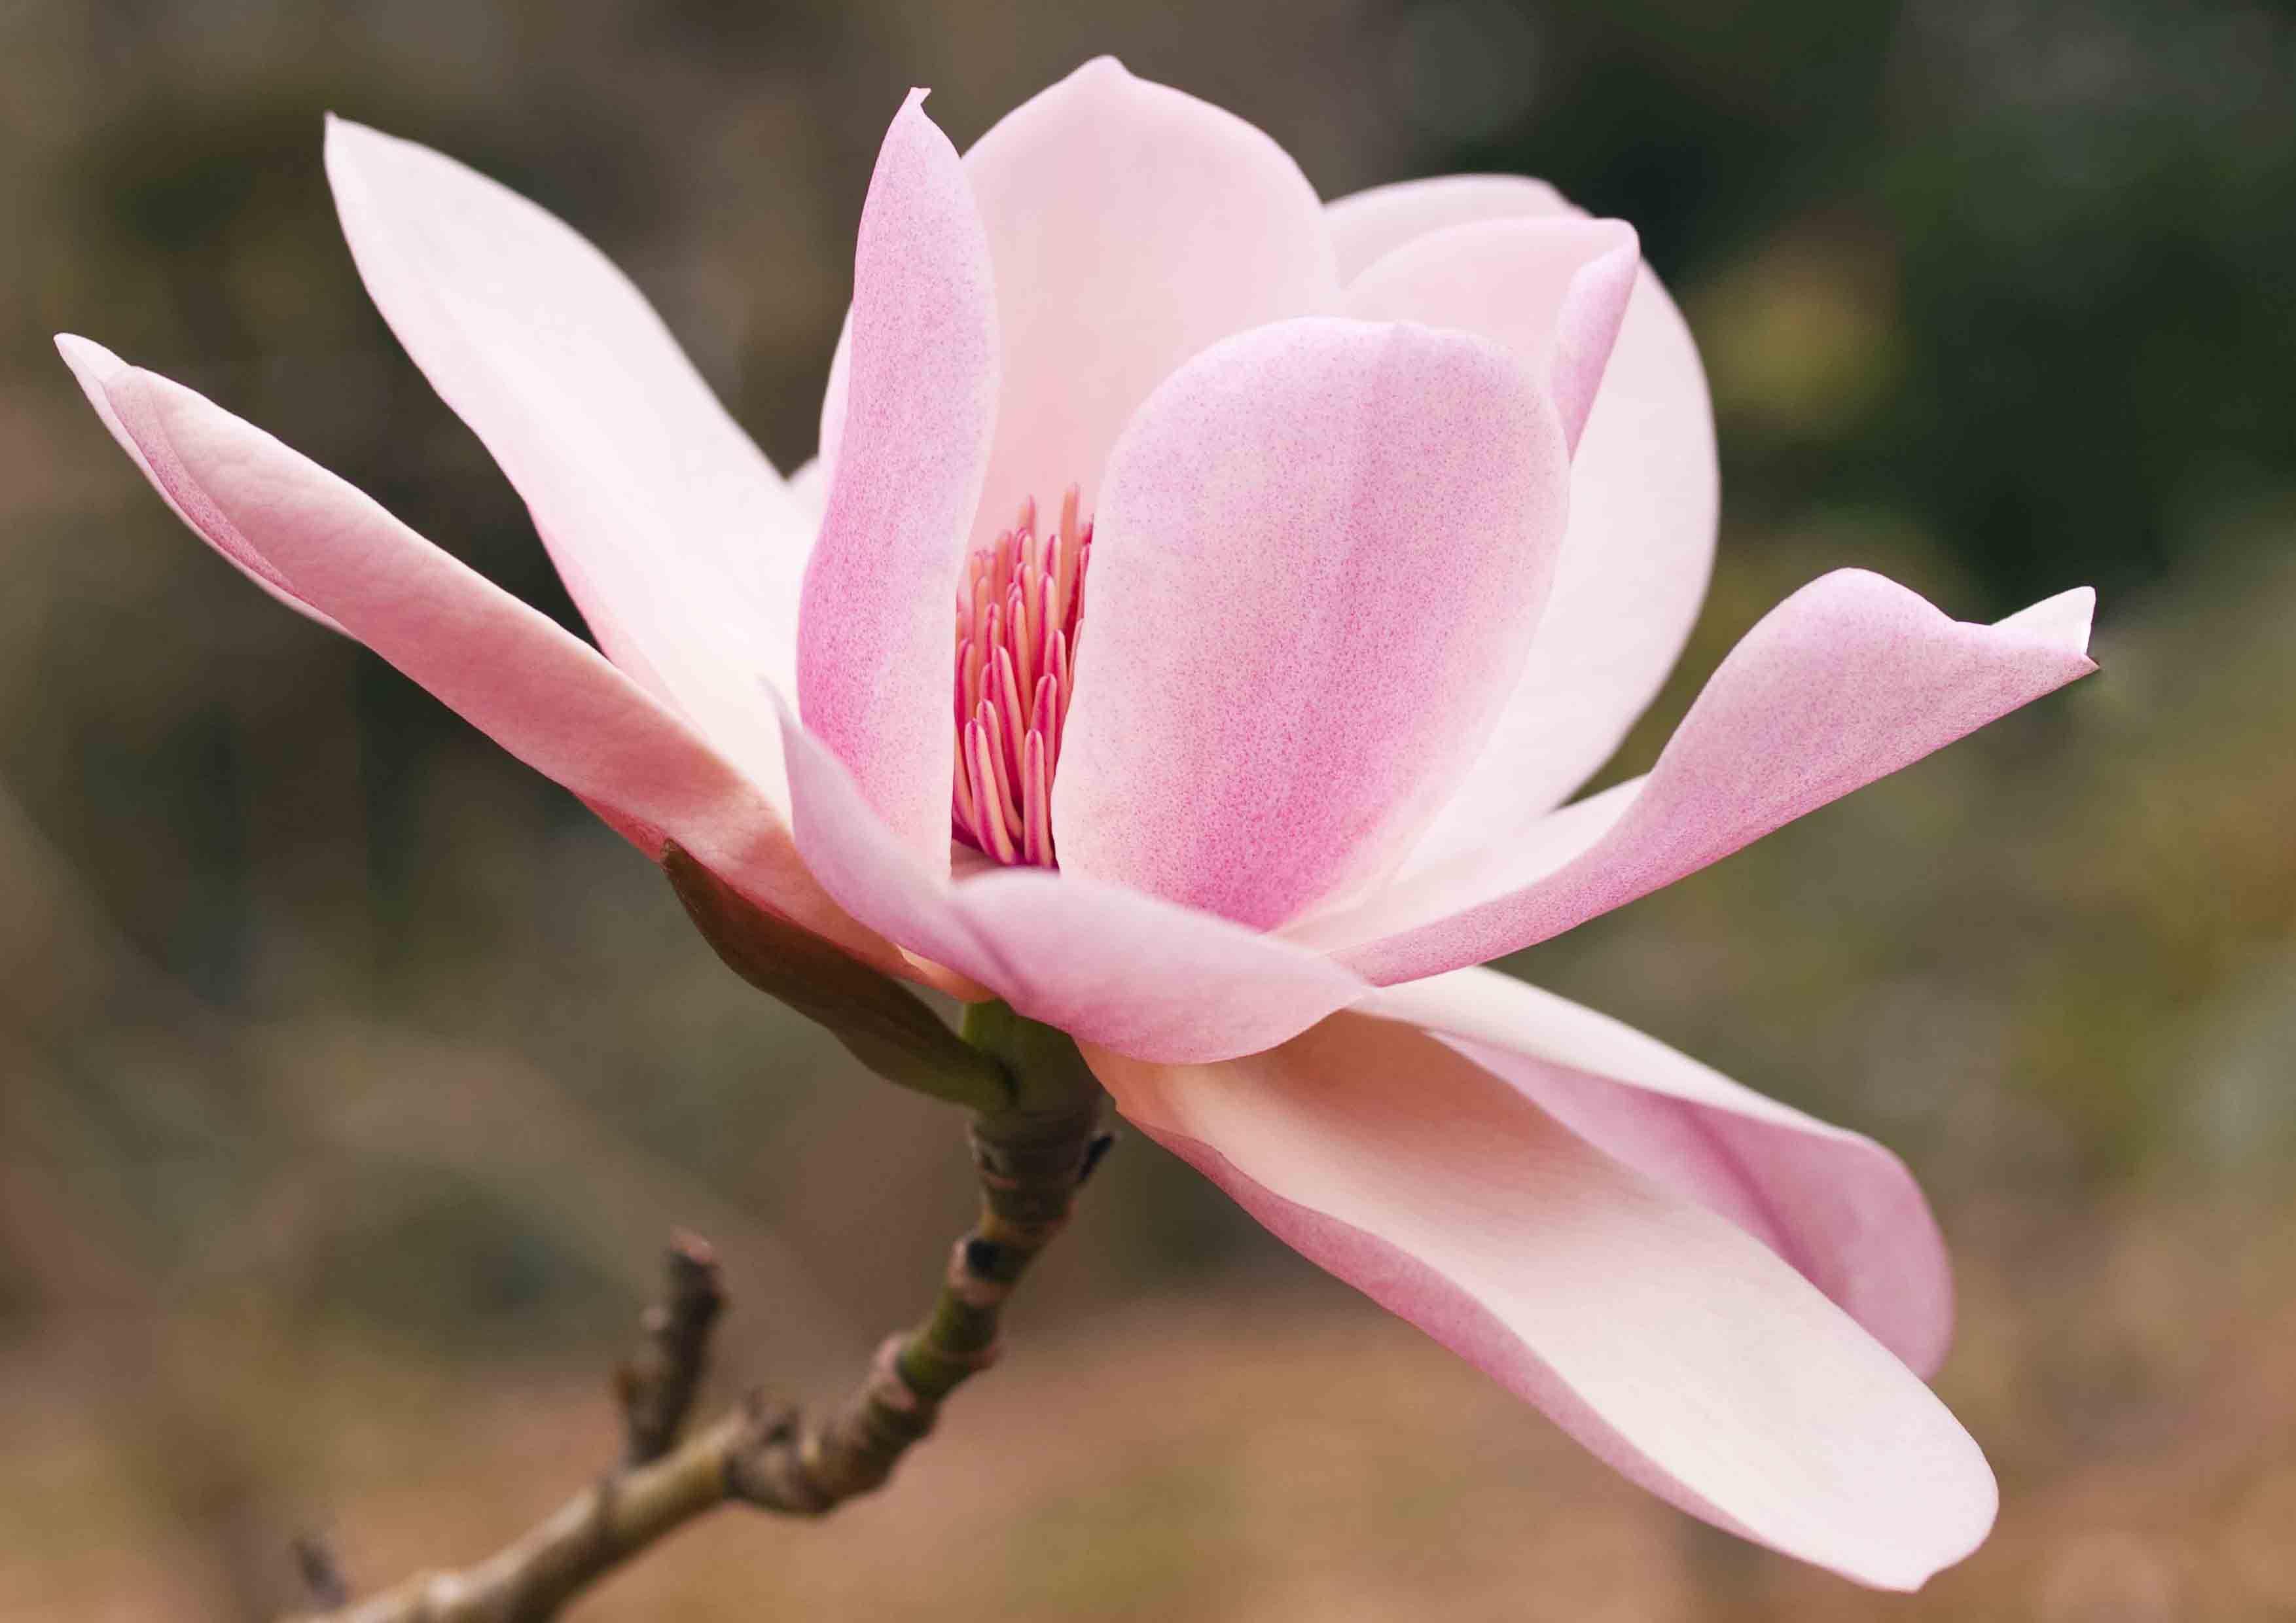 Pin by mandy geddings on flowers pinterest flowers magnolia picturespink magnolia flower headg 35082480 love flowers mightylinksfo